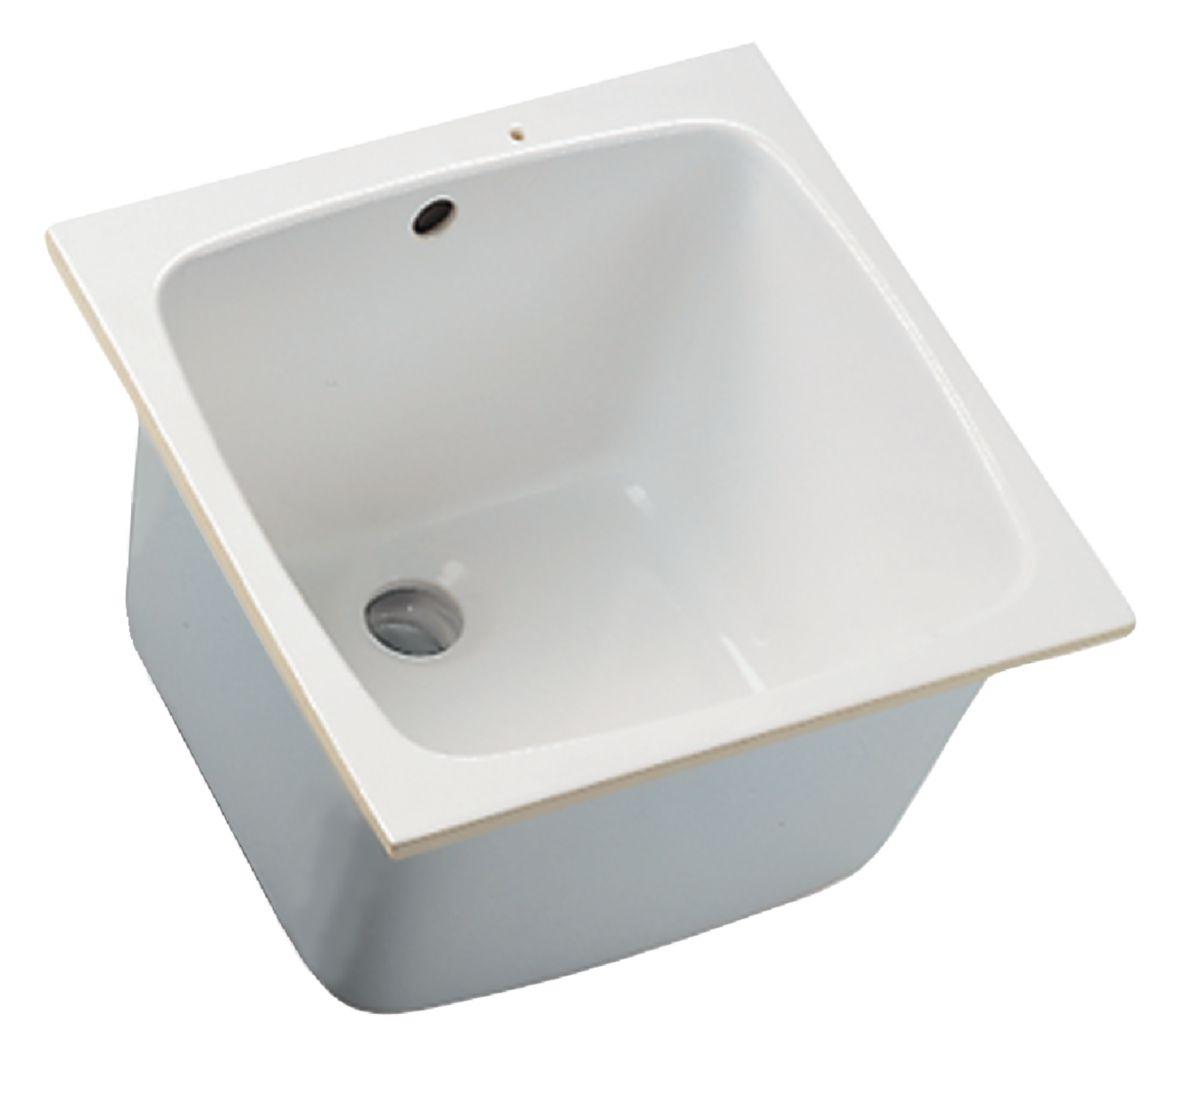 100 evier ceramique 1 bac plan c ramique 1 vasque seducta 60 cm blanc alterna nettoyer. Black Bedroom Furniture Sets. Home Design Ideas